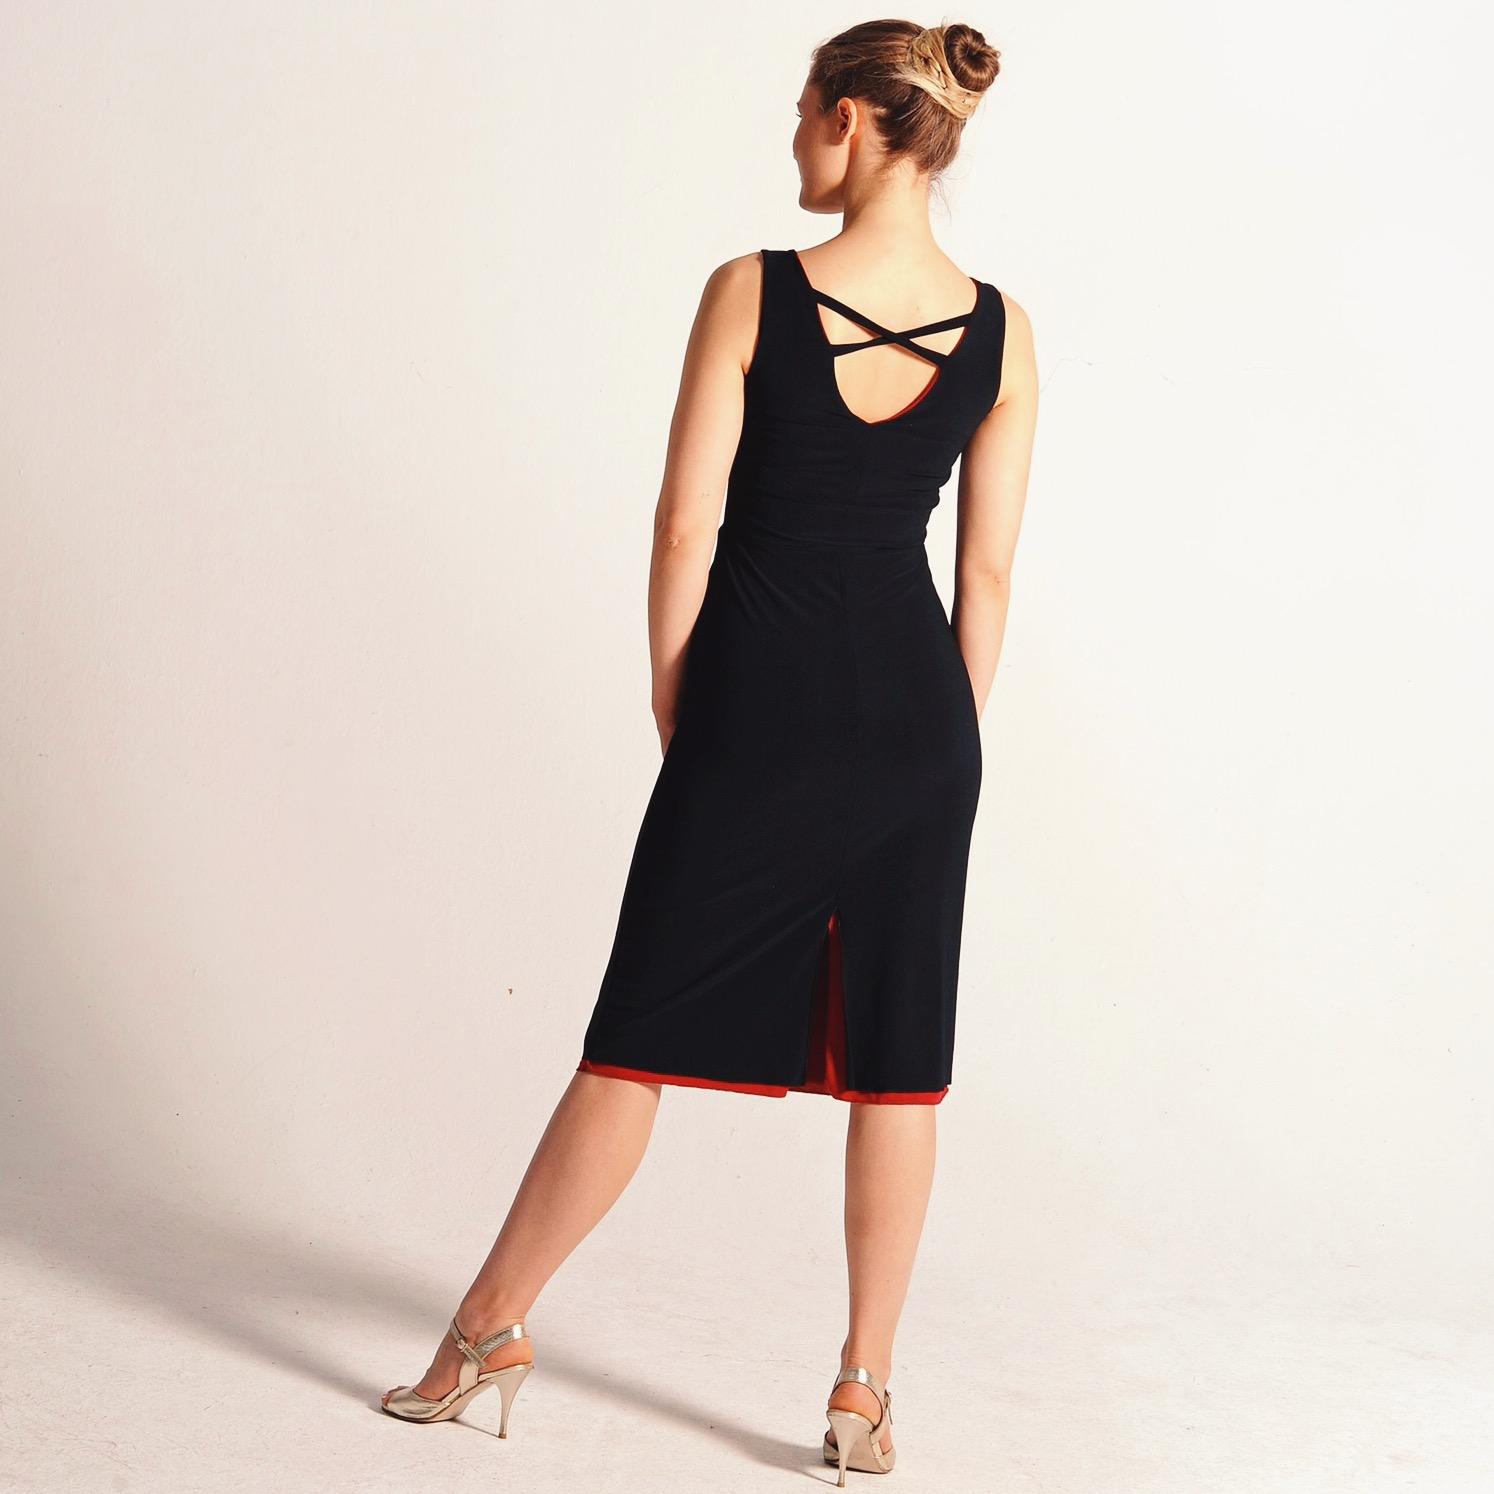 black_tango_dress_coleccionberlin_ISABEL.JPG